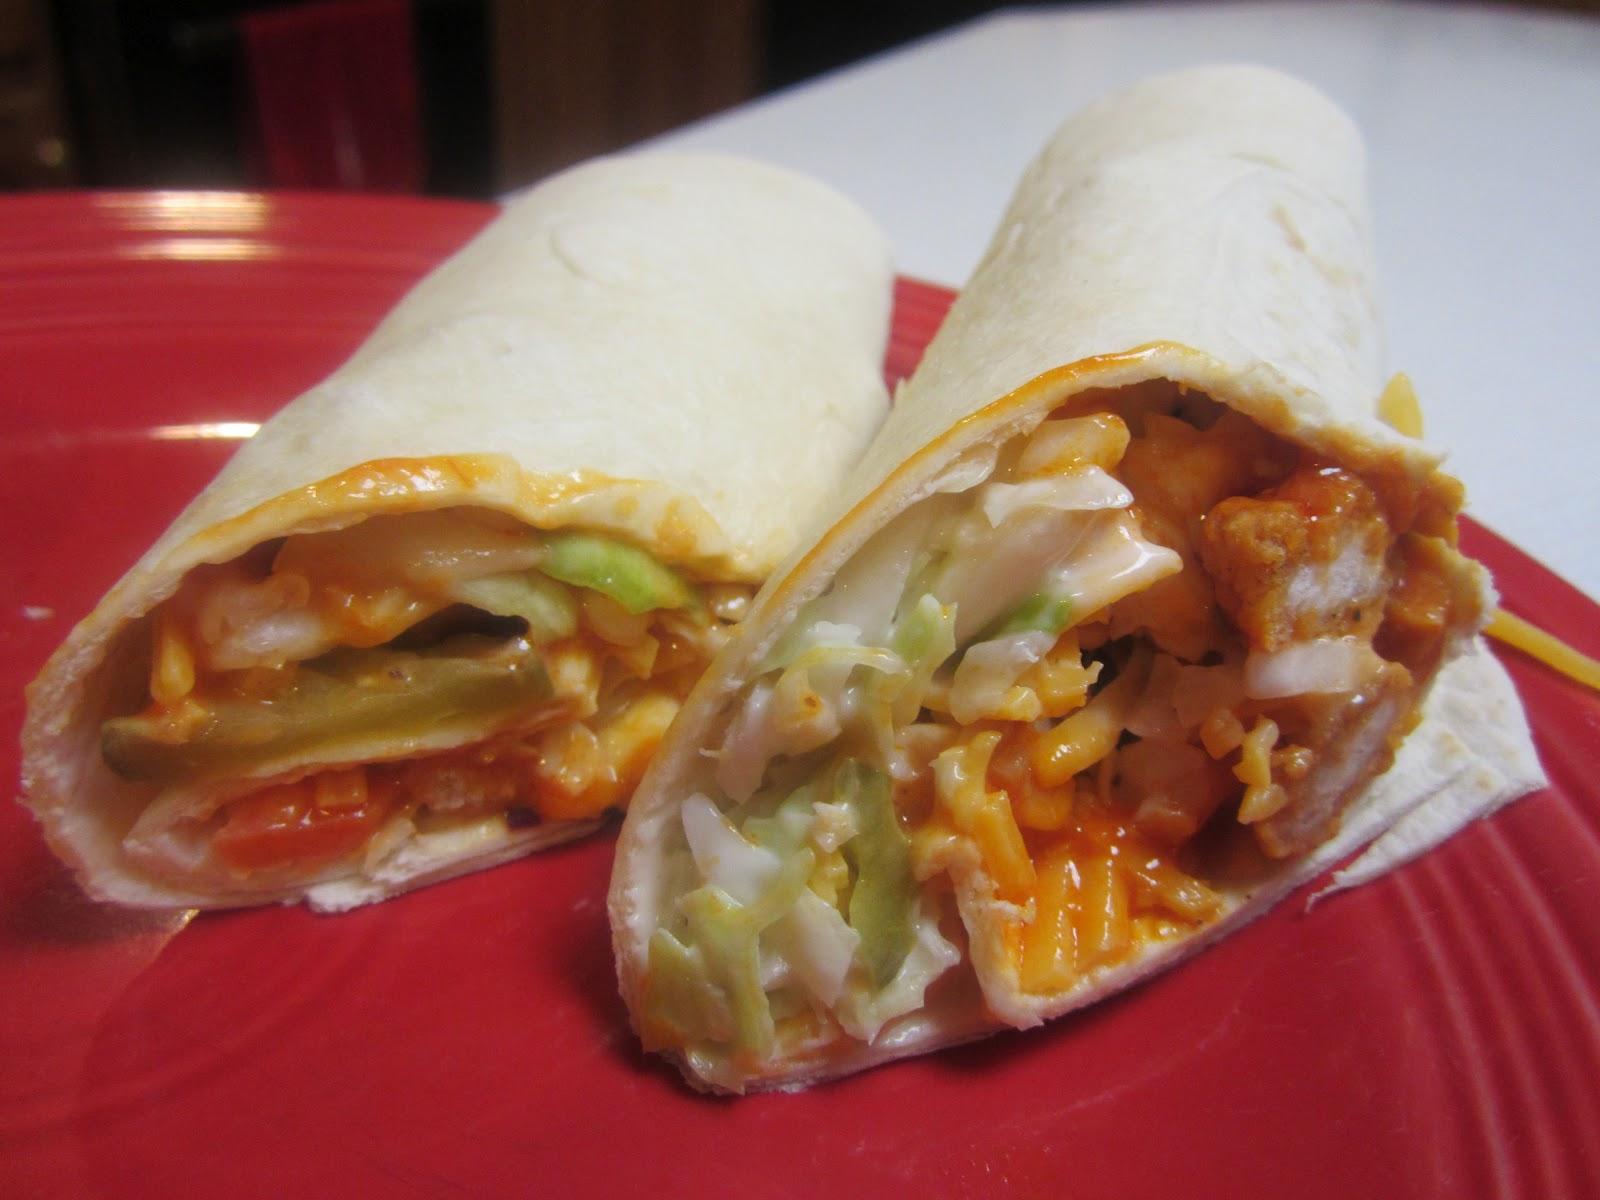 Cheddar S Scratch Kitchen Half Grilled Buffalo Chicken Wrapper